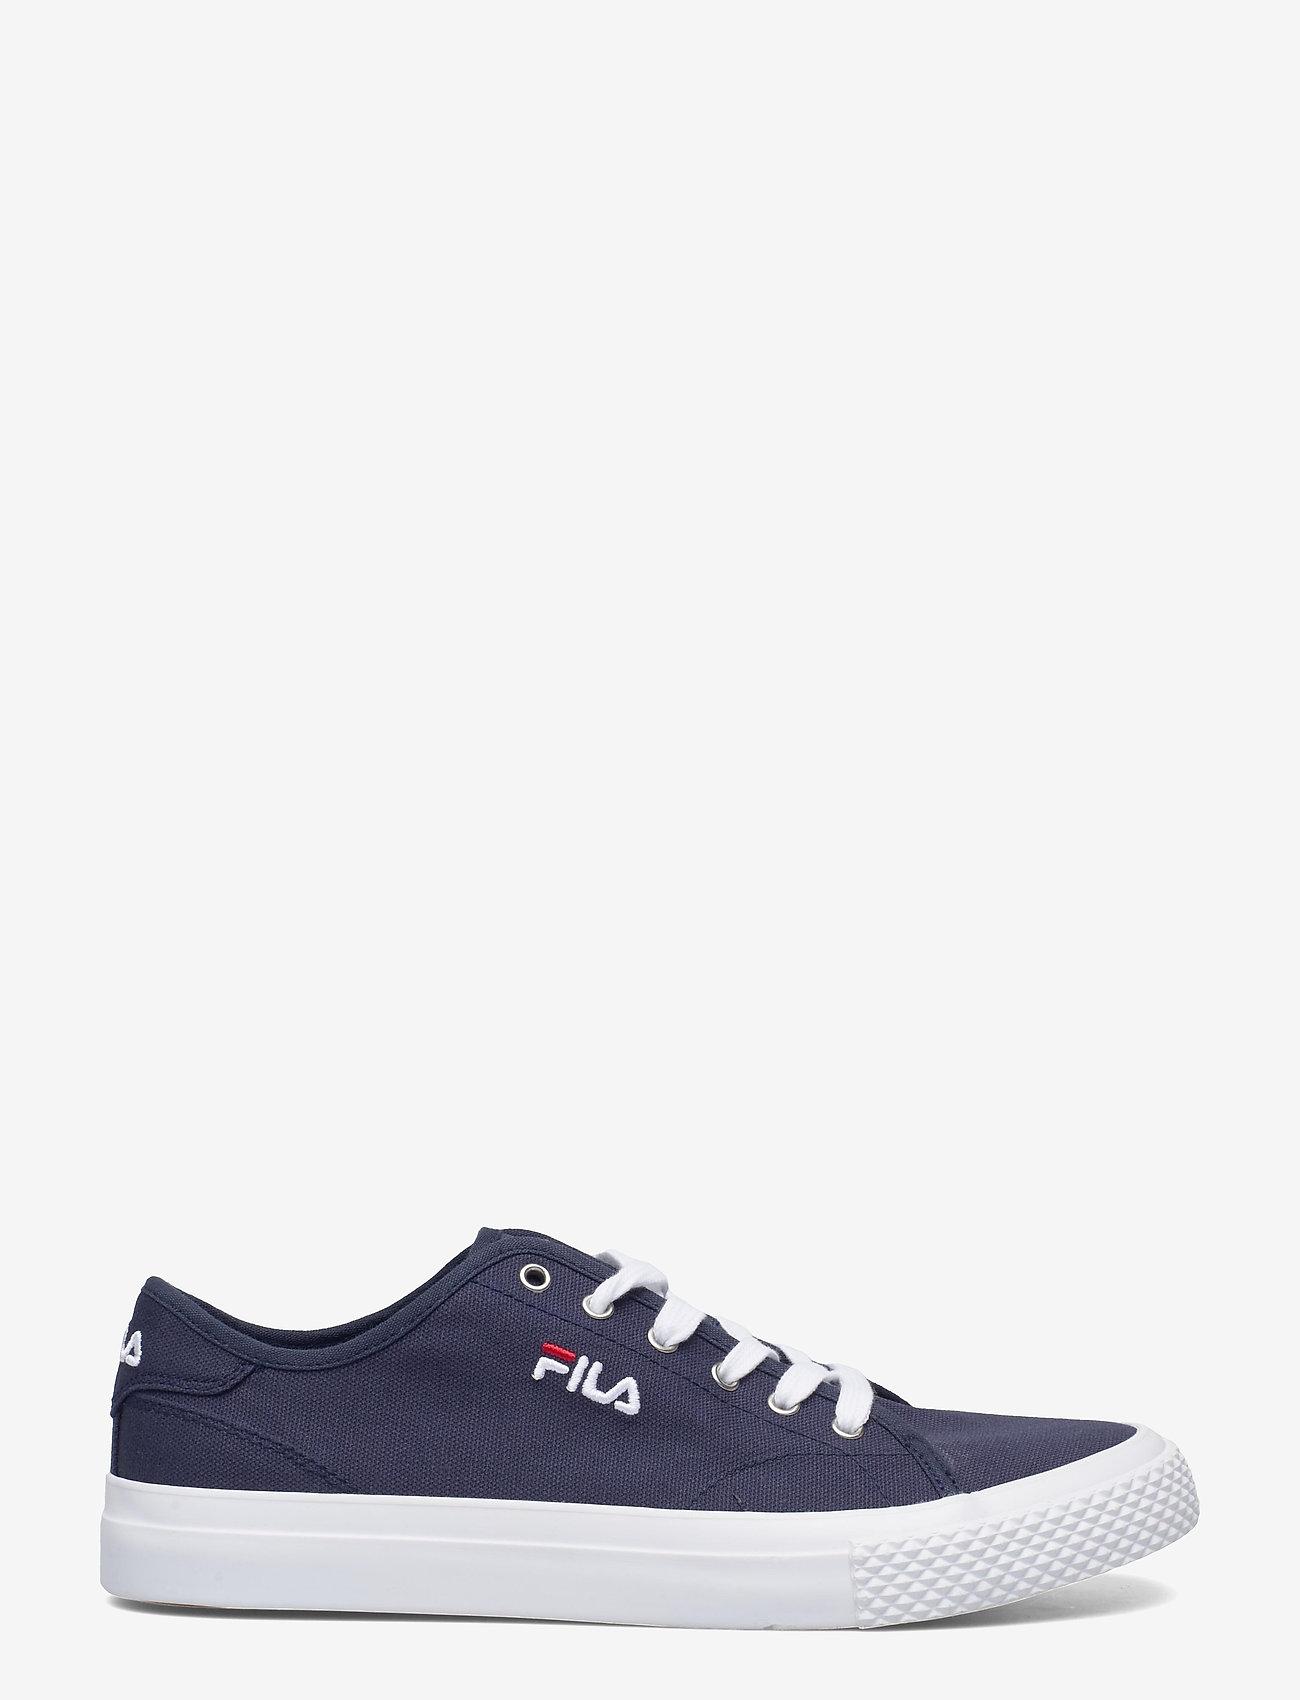 FILA - Pointer Classic - baskets basses - fila navy - 0